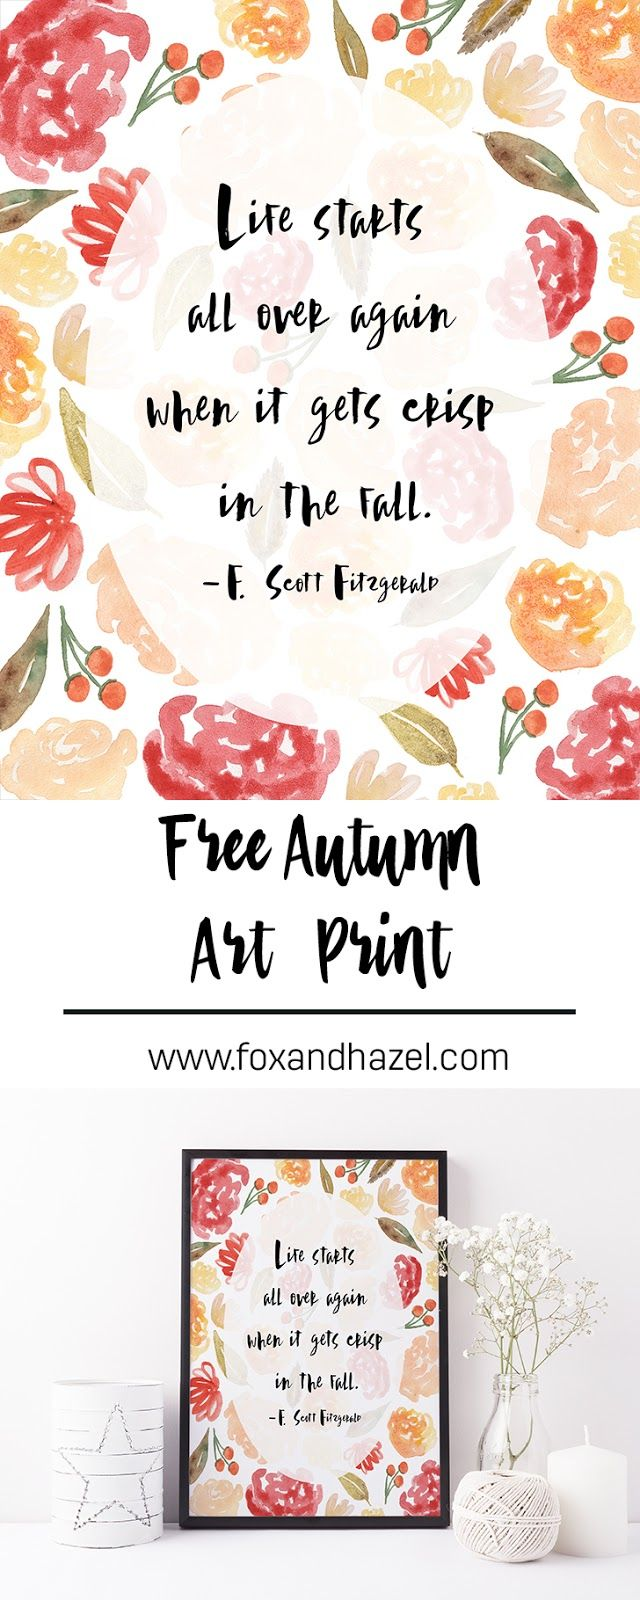 Fox & Hazel - Free Autumn Art Print